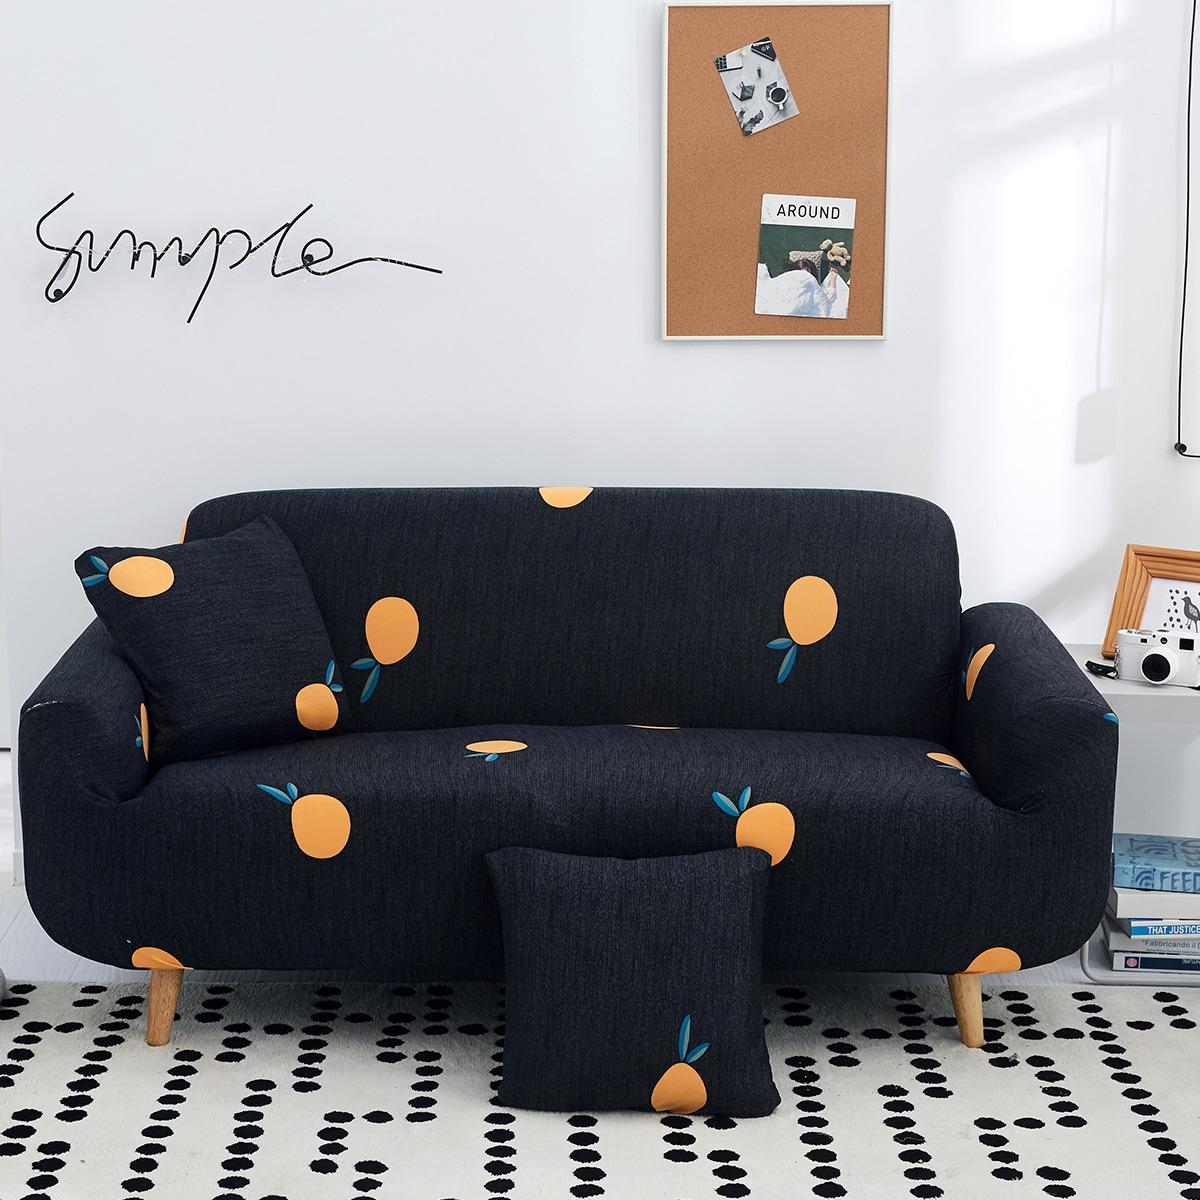 Чехол для дивана с оранжевым принтом без подушки фото